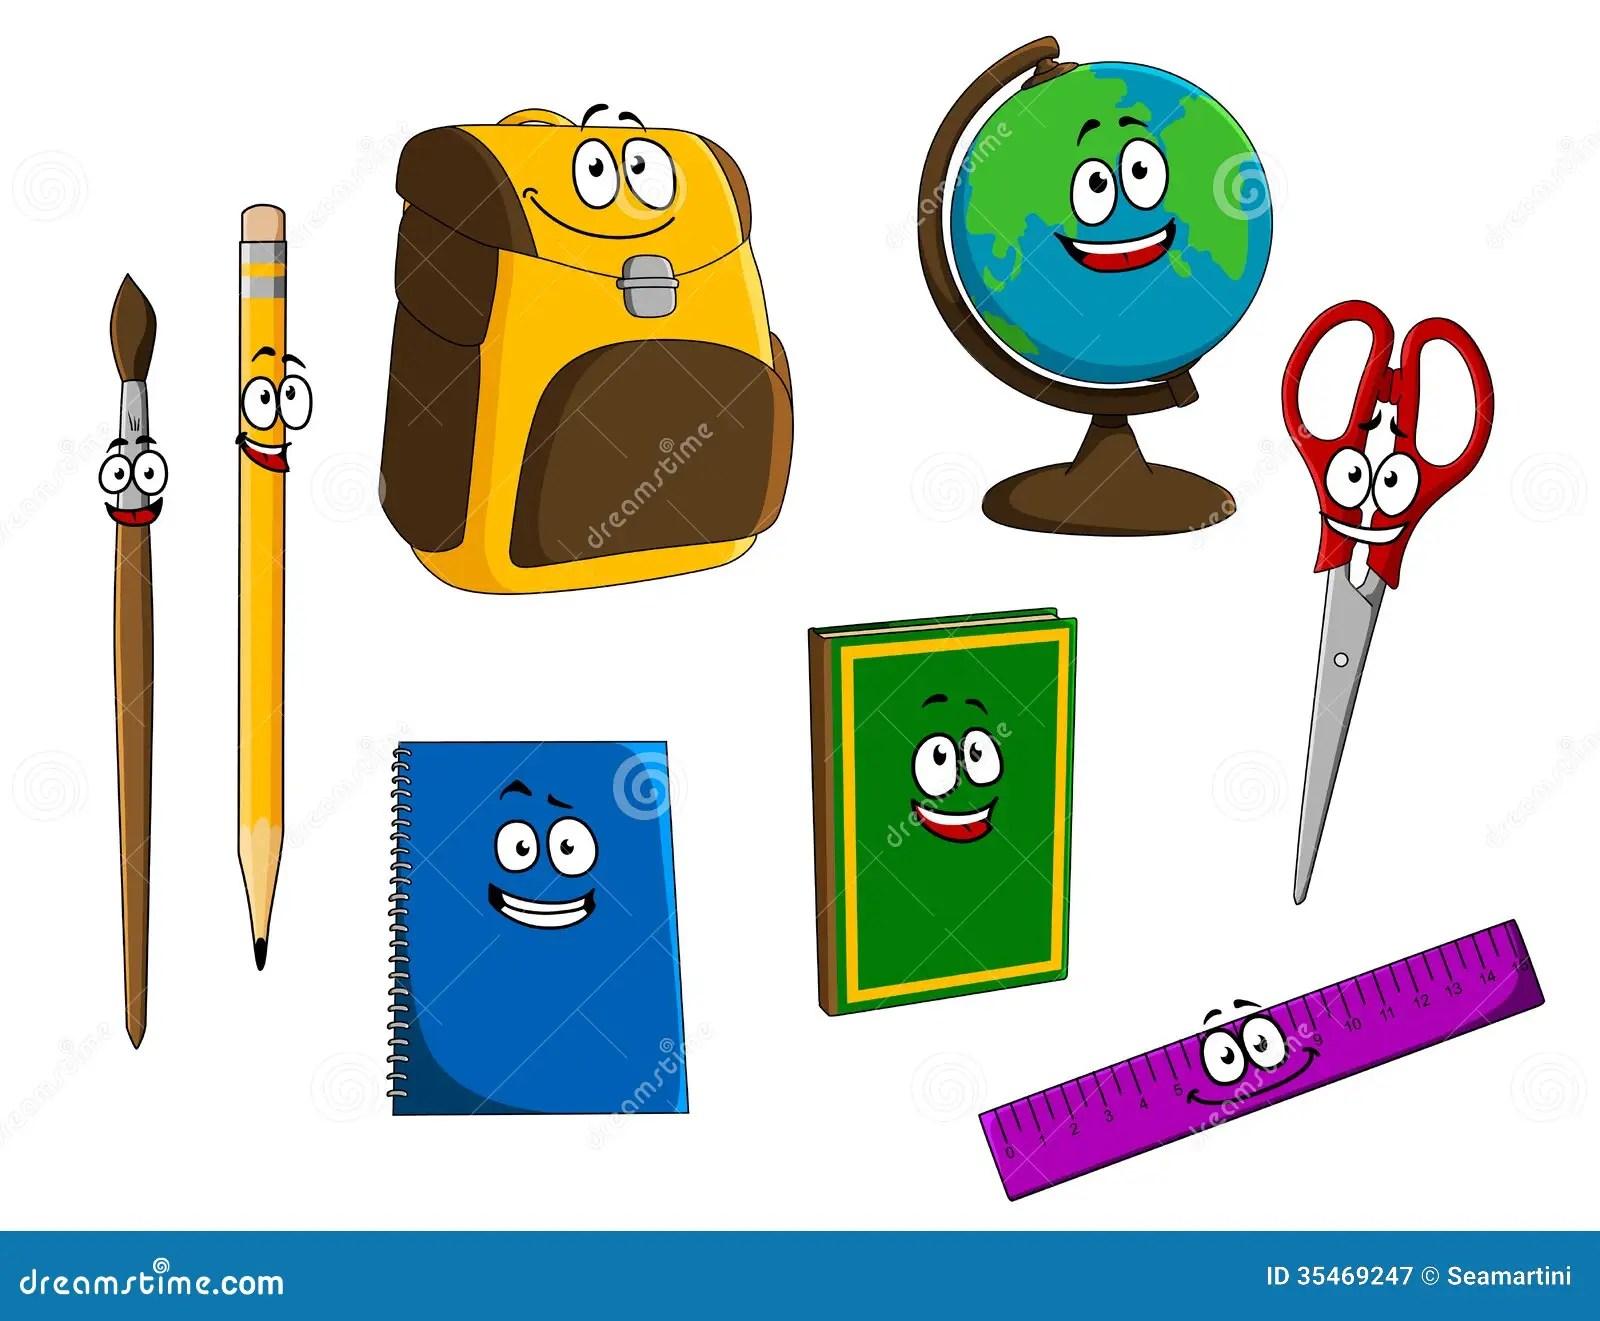 Cartoon School Objects Royalty Free Stock Photography